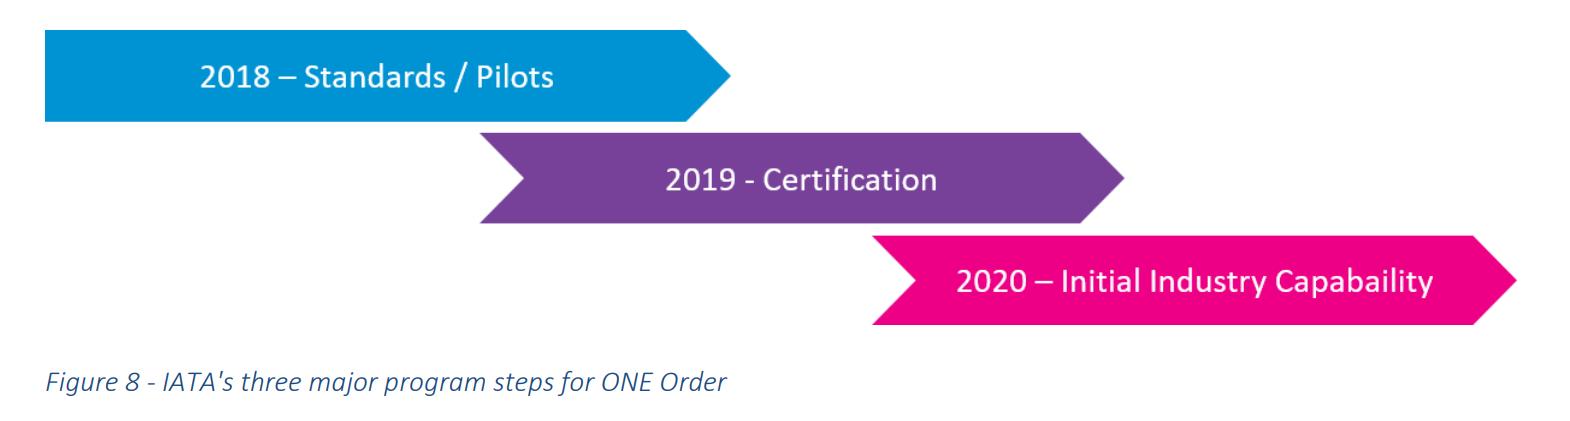 3 year roadmap of ONE Order adoption